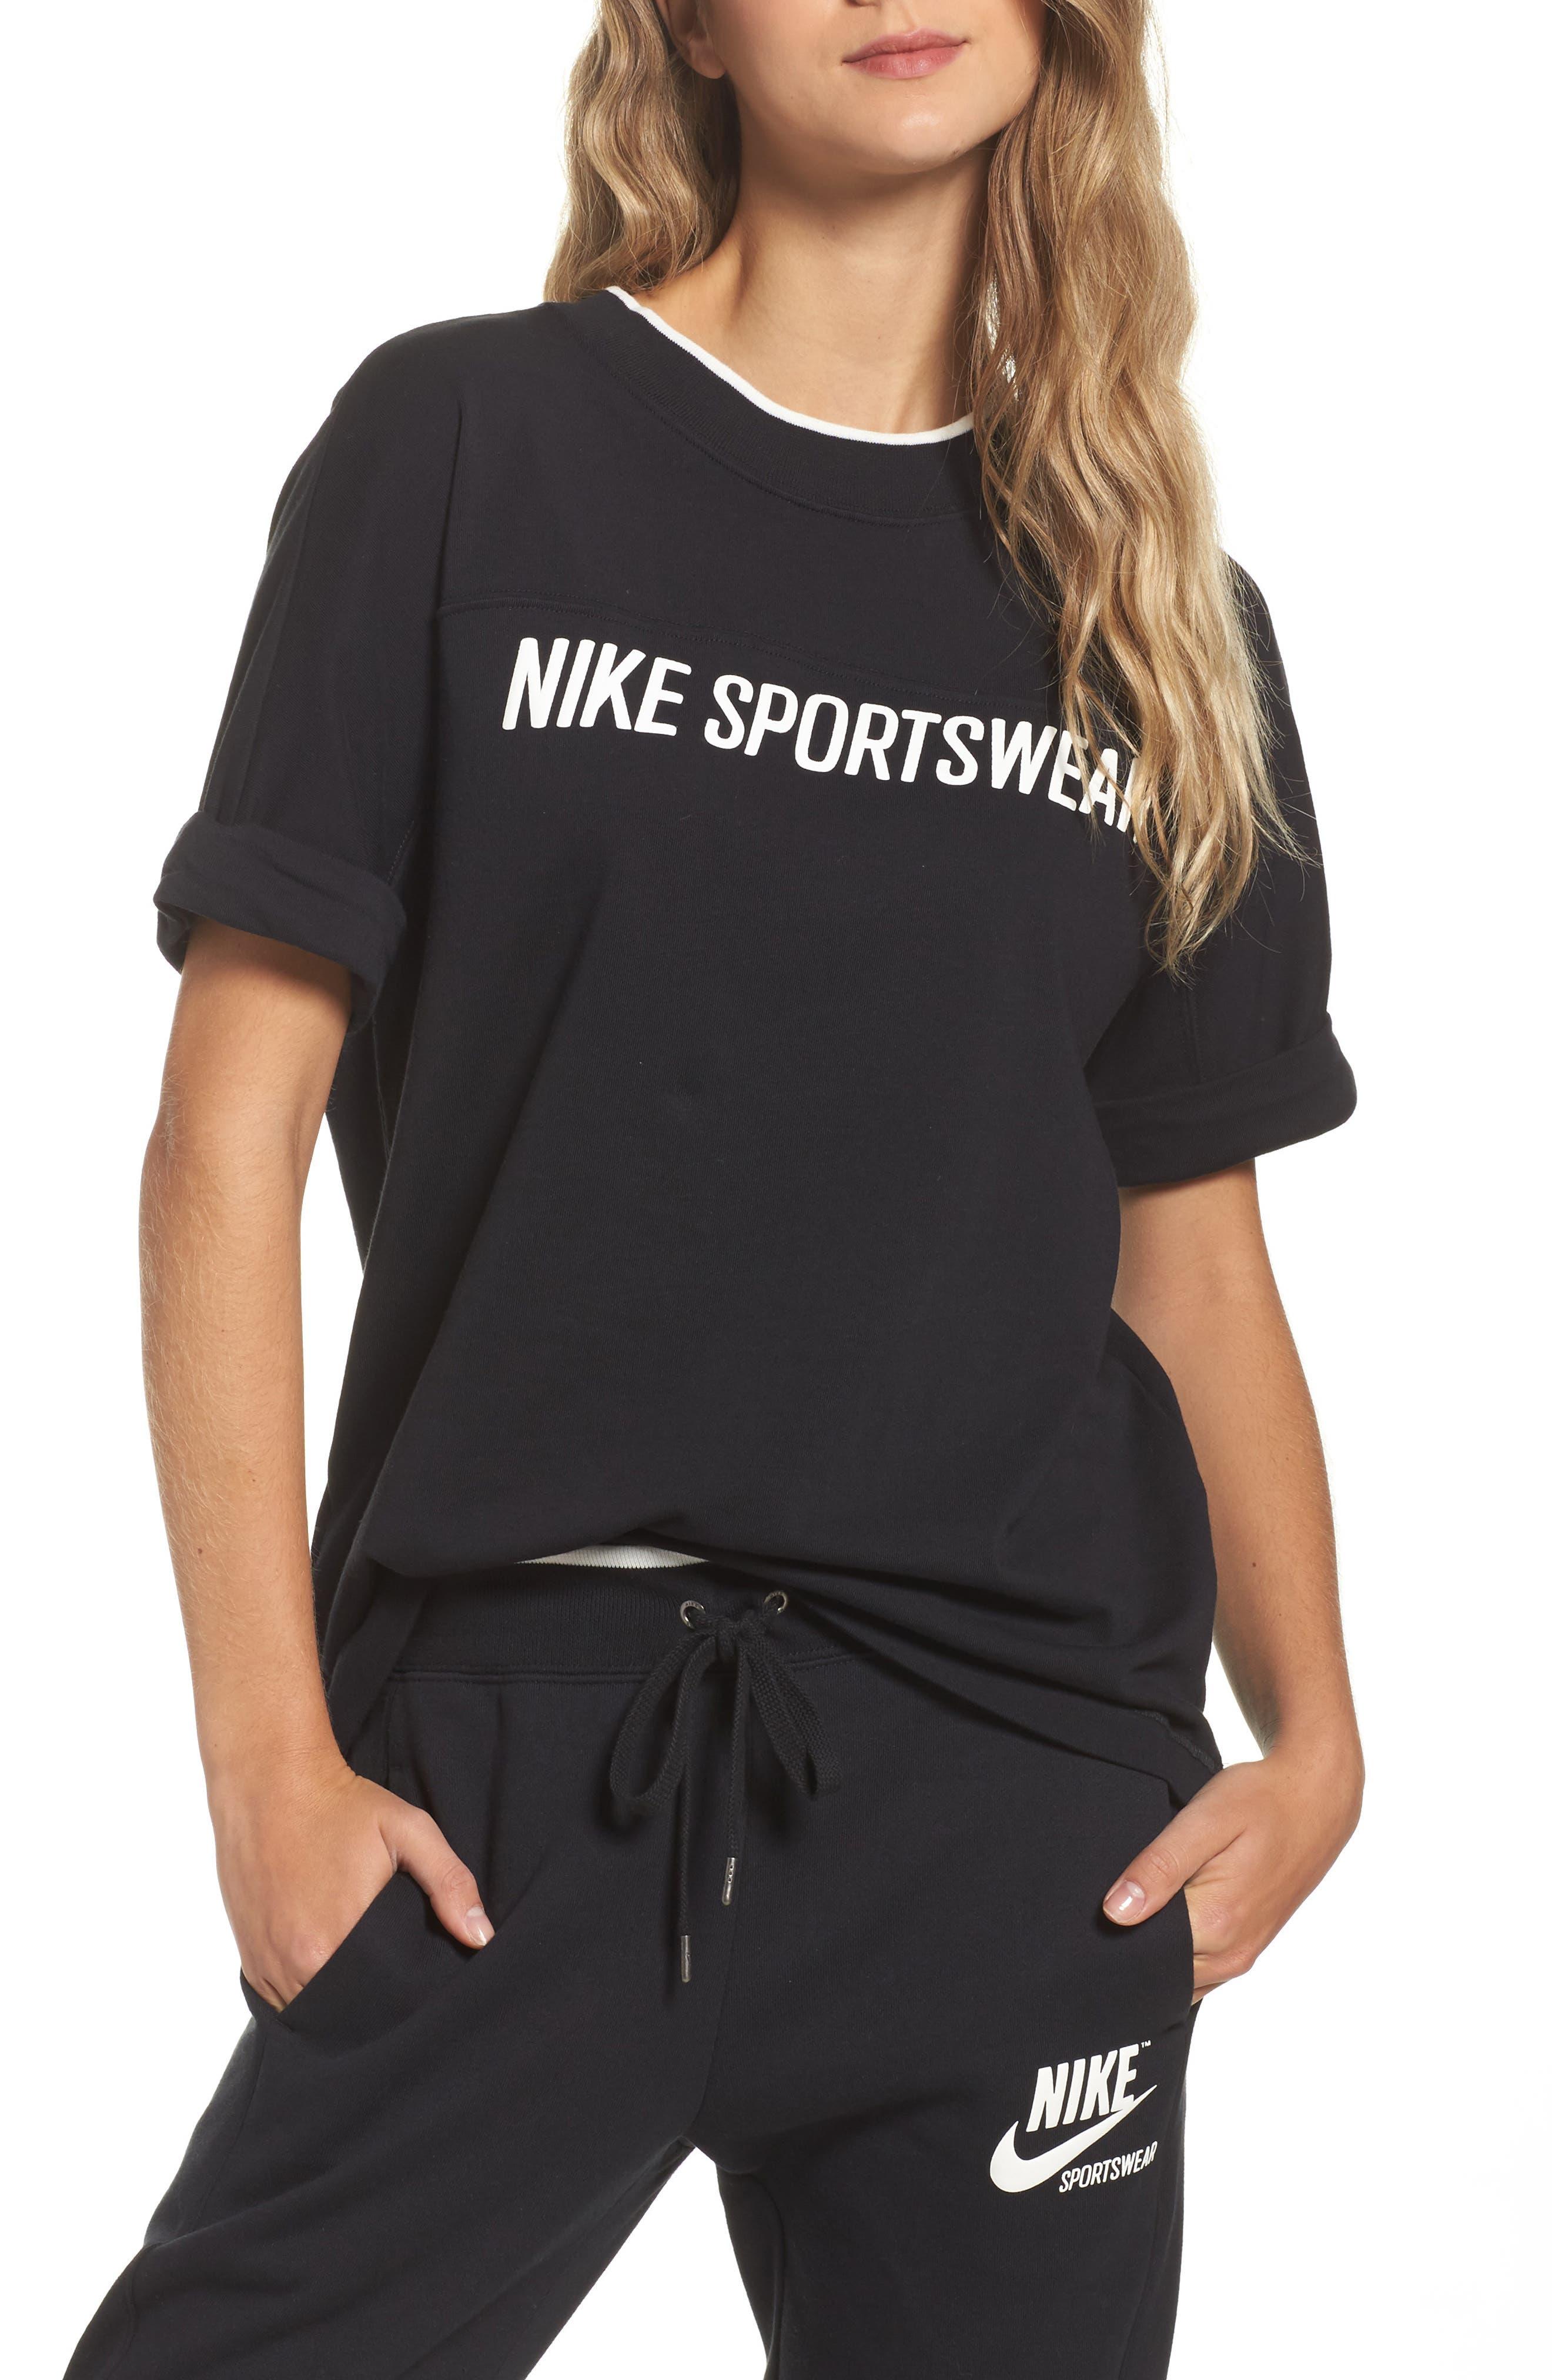 Sportswear Archive Tee,                             Main thumbnail 1, color,                             Black/ Black/ Sail